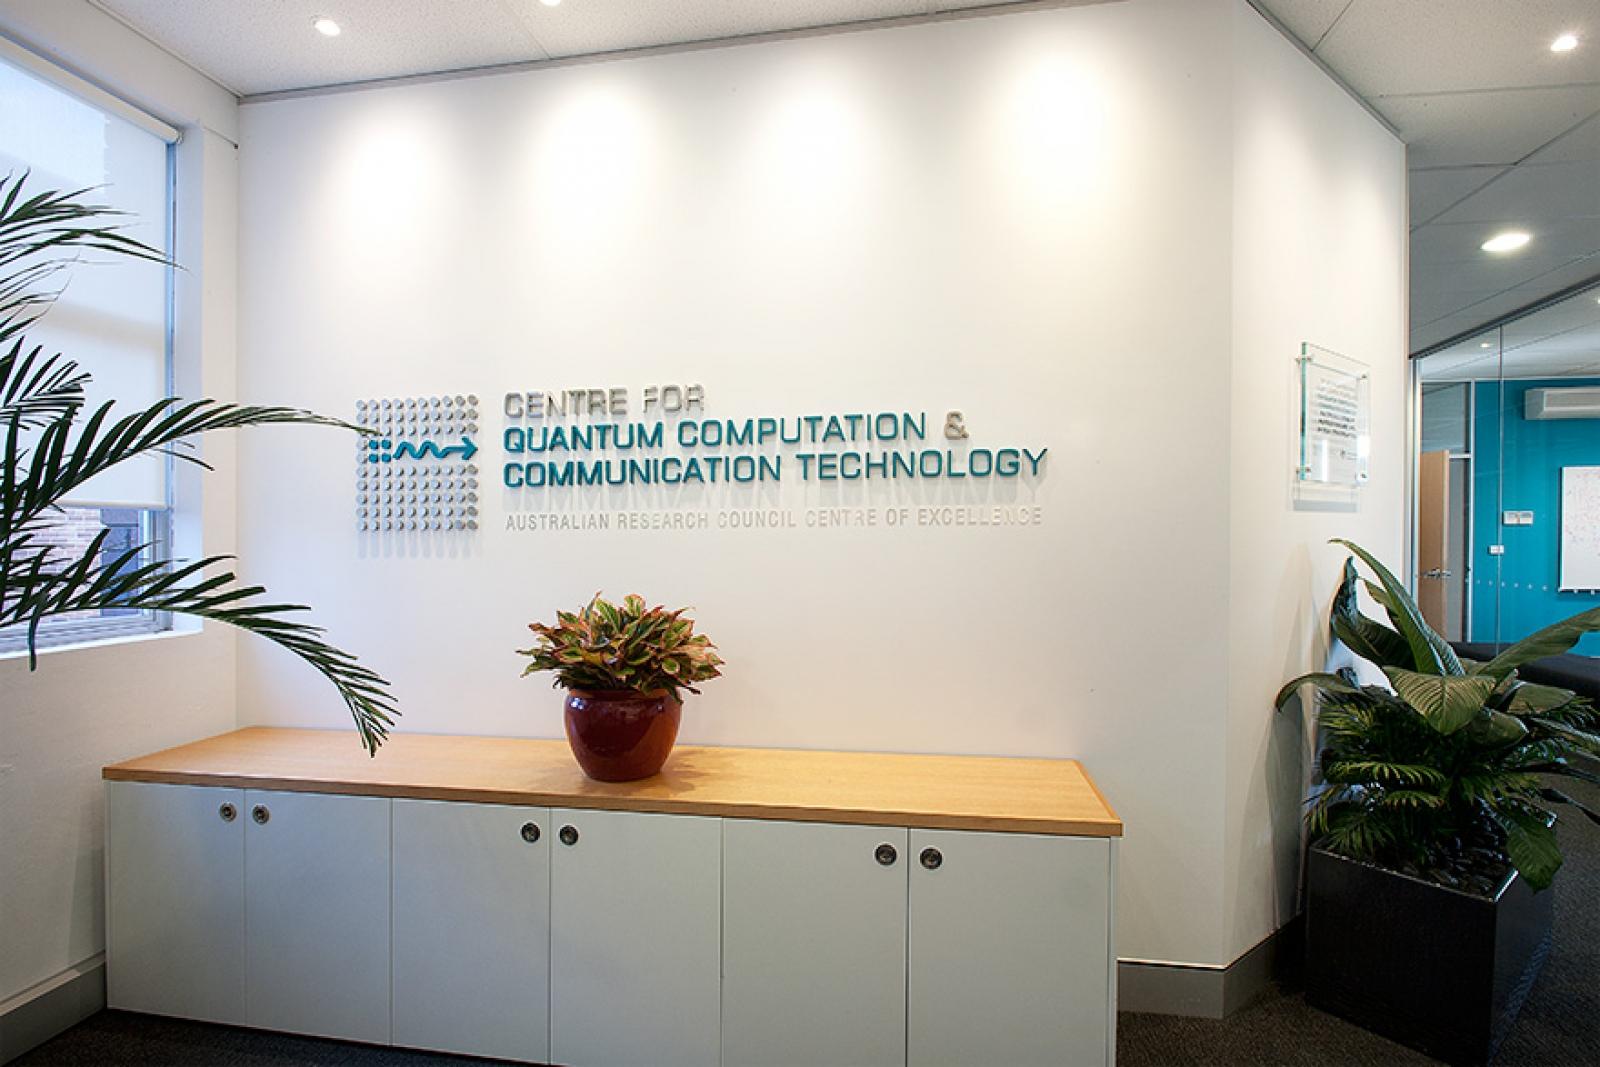 Quantum Computation and Communication Technology